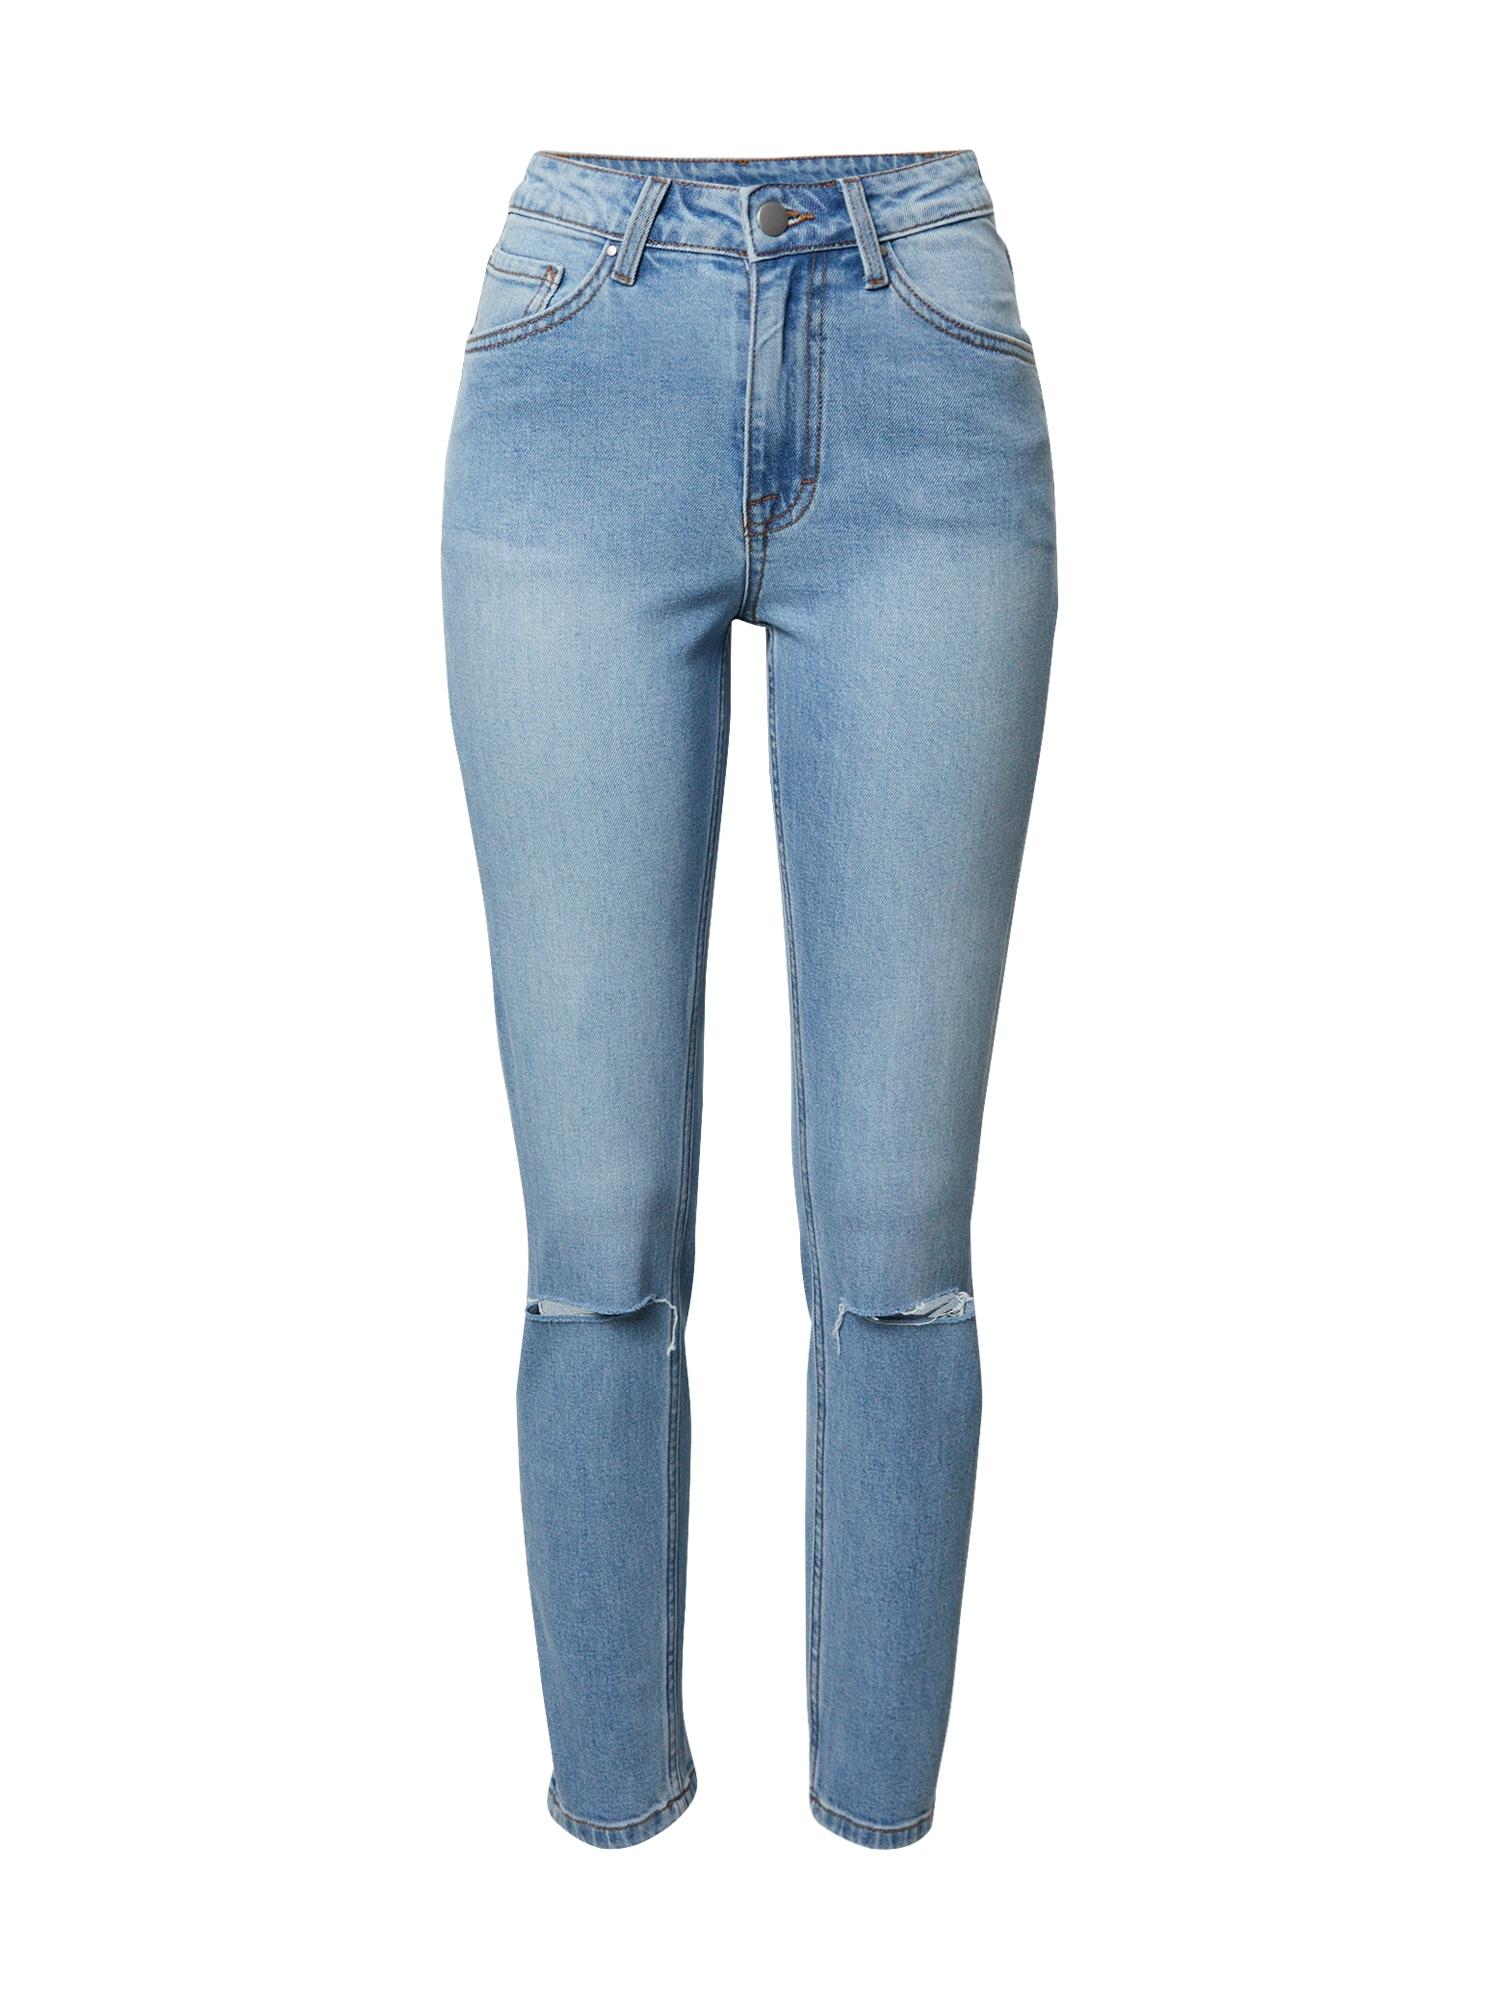 VIERVIER Džinsai 'Isabell' tamsiai (džinso) mėlyna